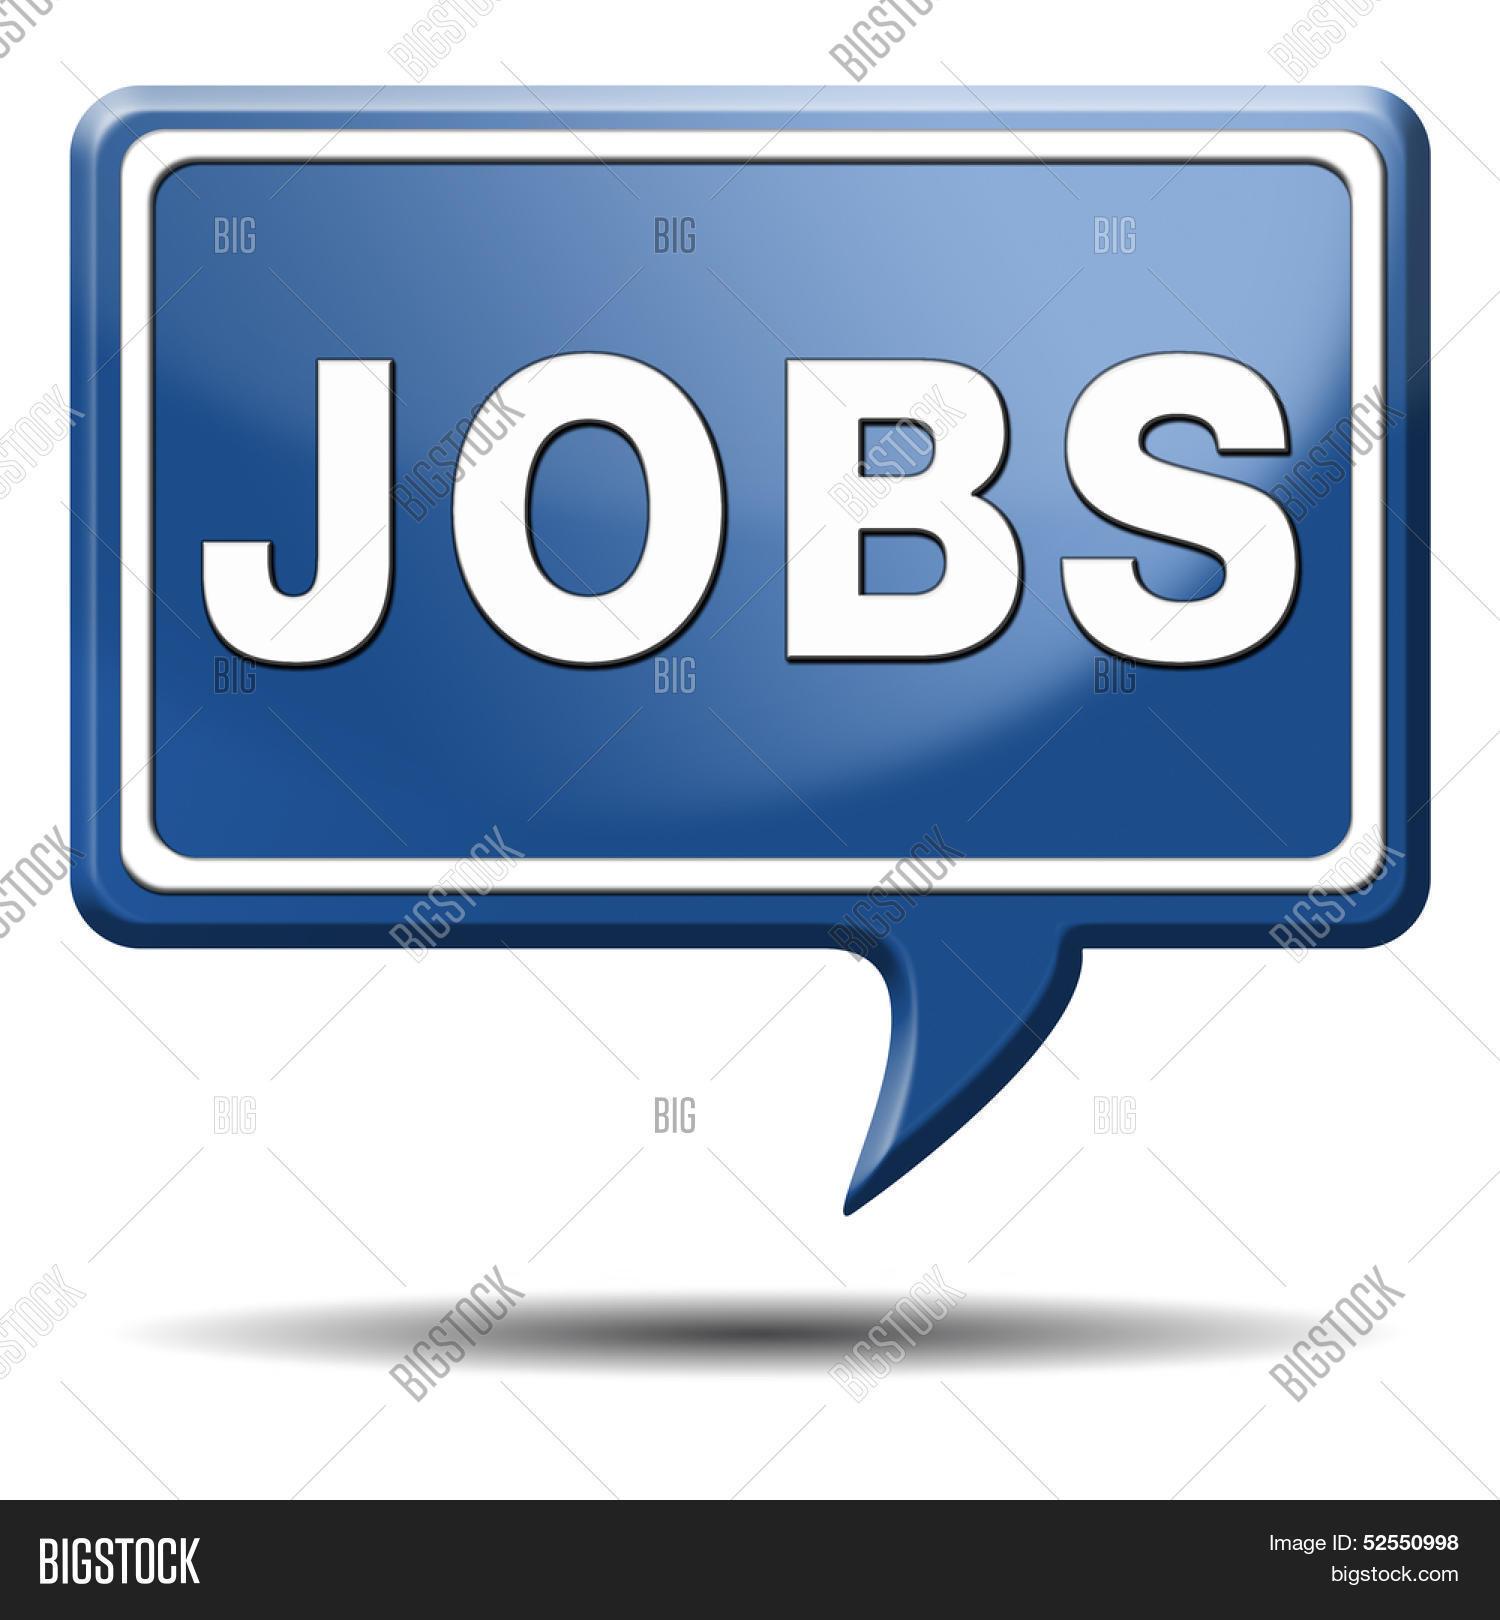 job search vacancy for jobs online job application help wanted job search vacancy for jobs online job application help wanted hiring now job sign job button